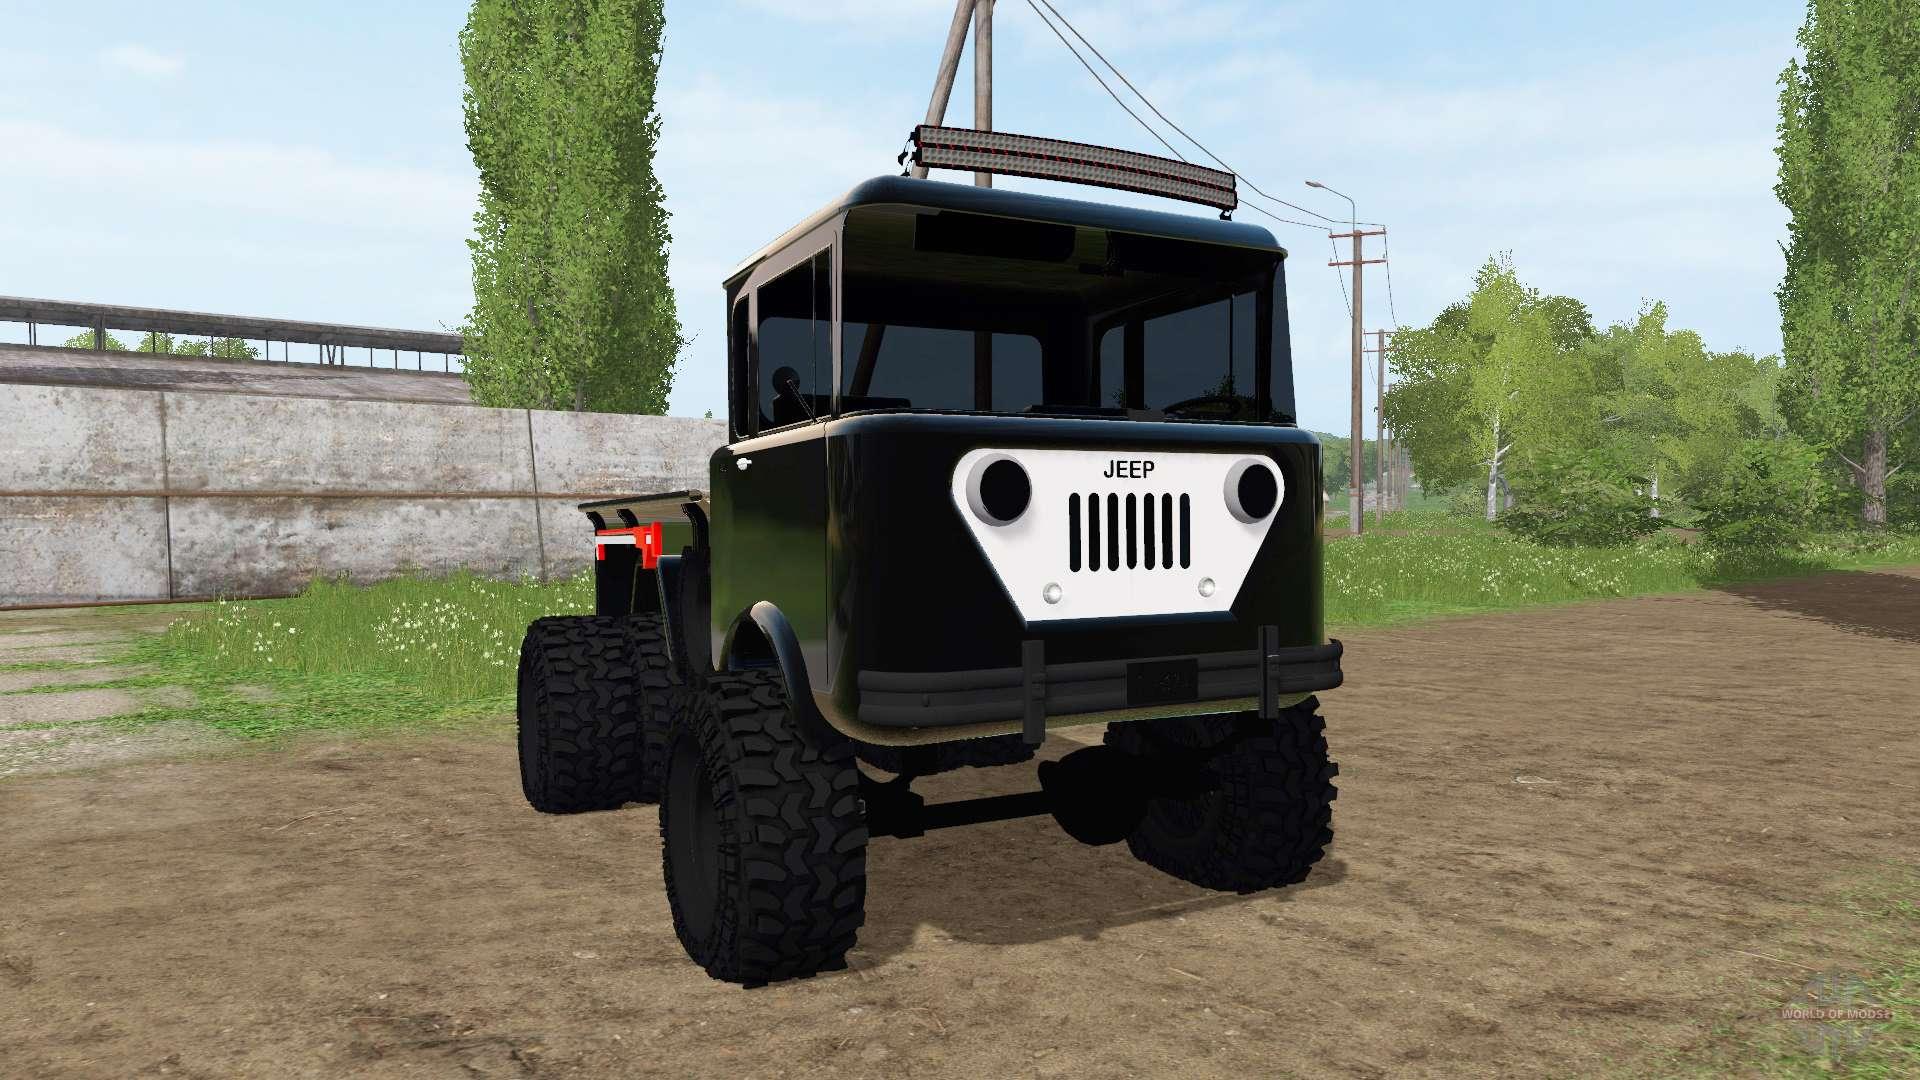 DAISY S JEEP V - Farming simulator modification